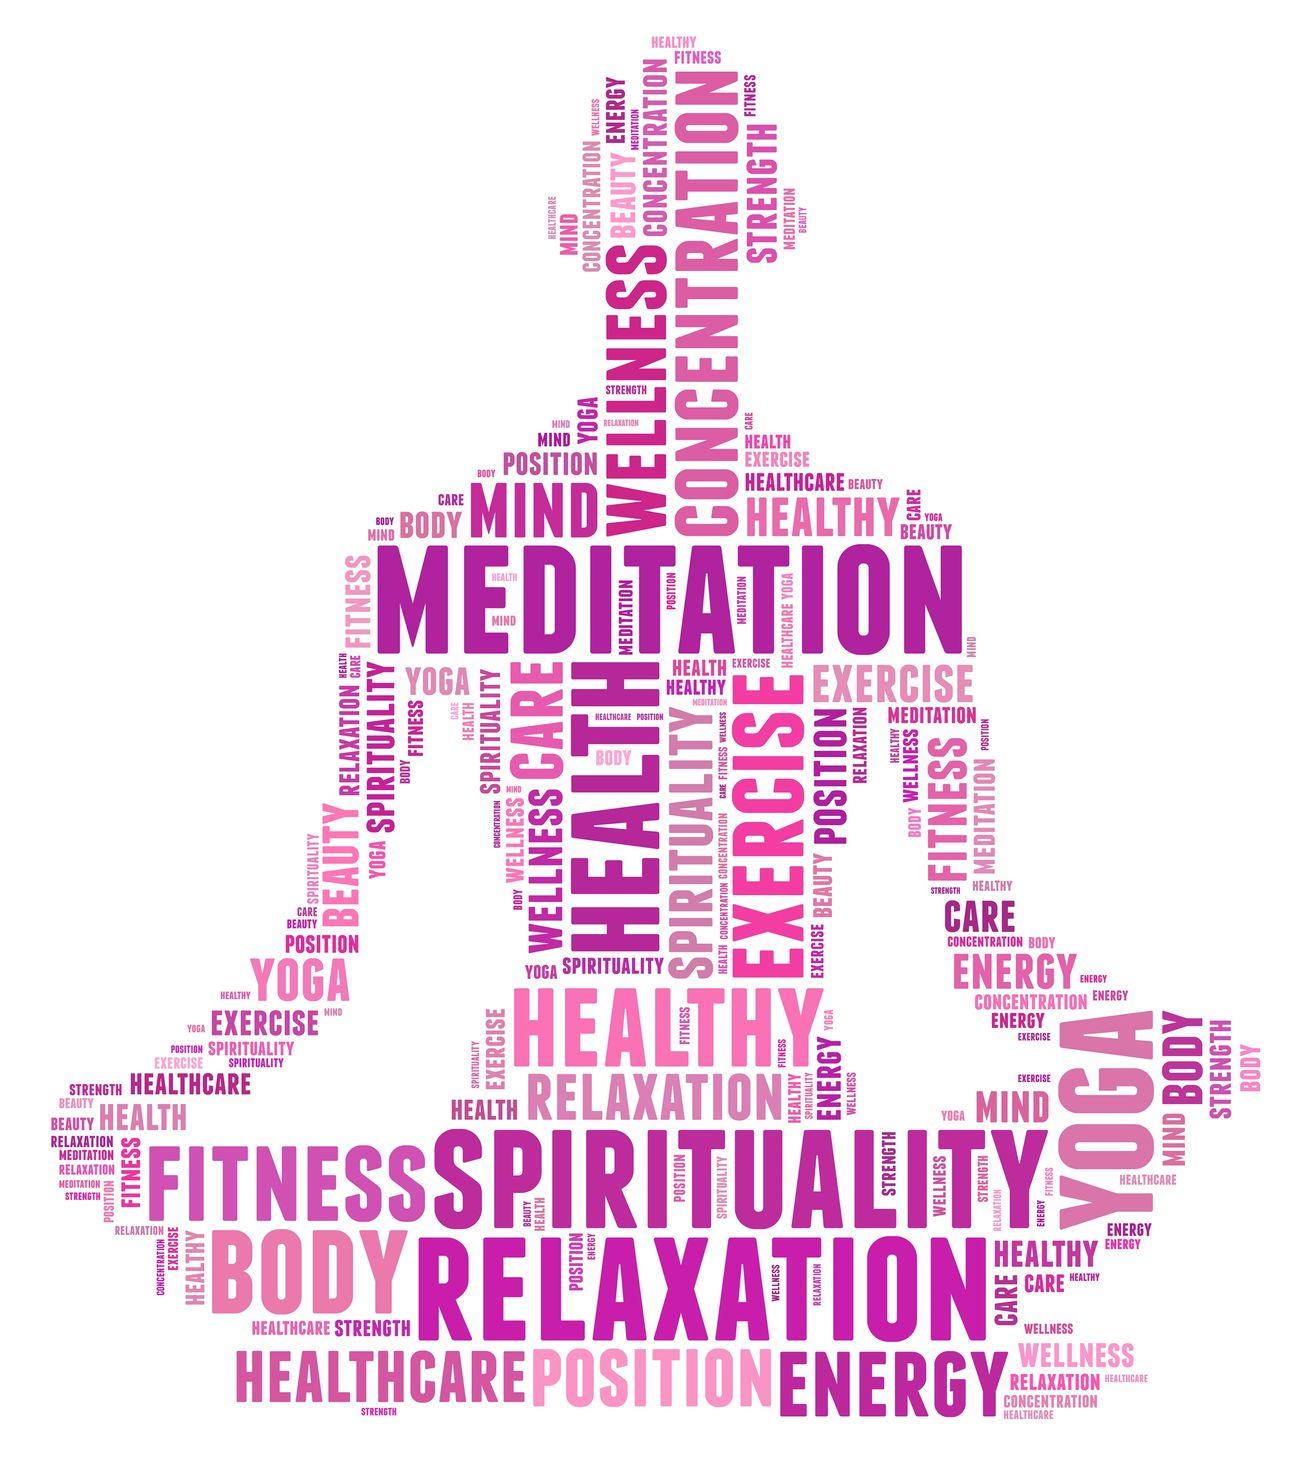 Meditation Posture, https://www.info-on-high-blood-pressure.com/Healing-Meditation.html